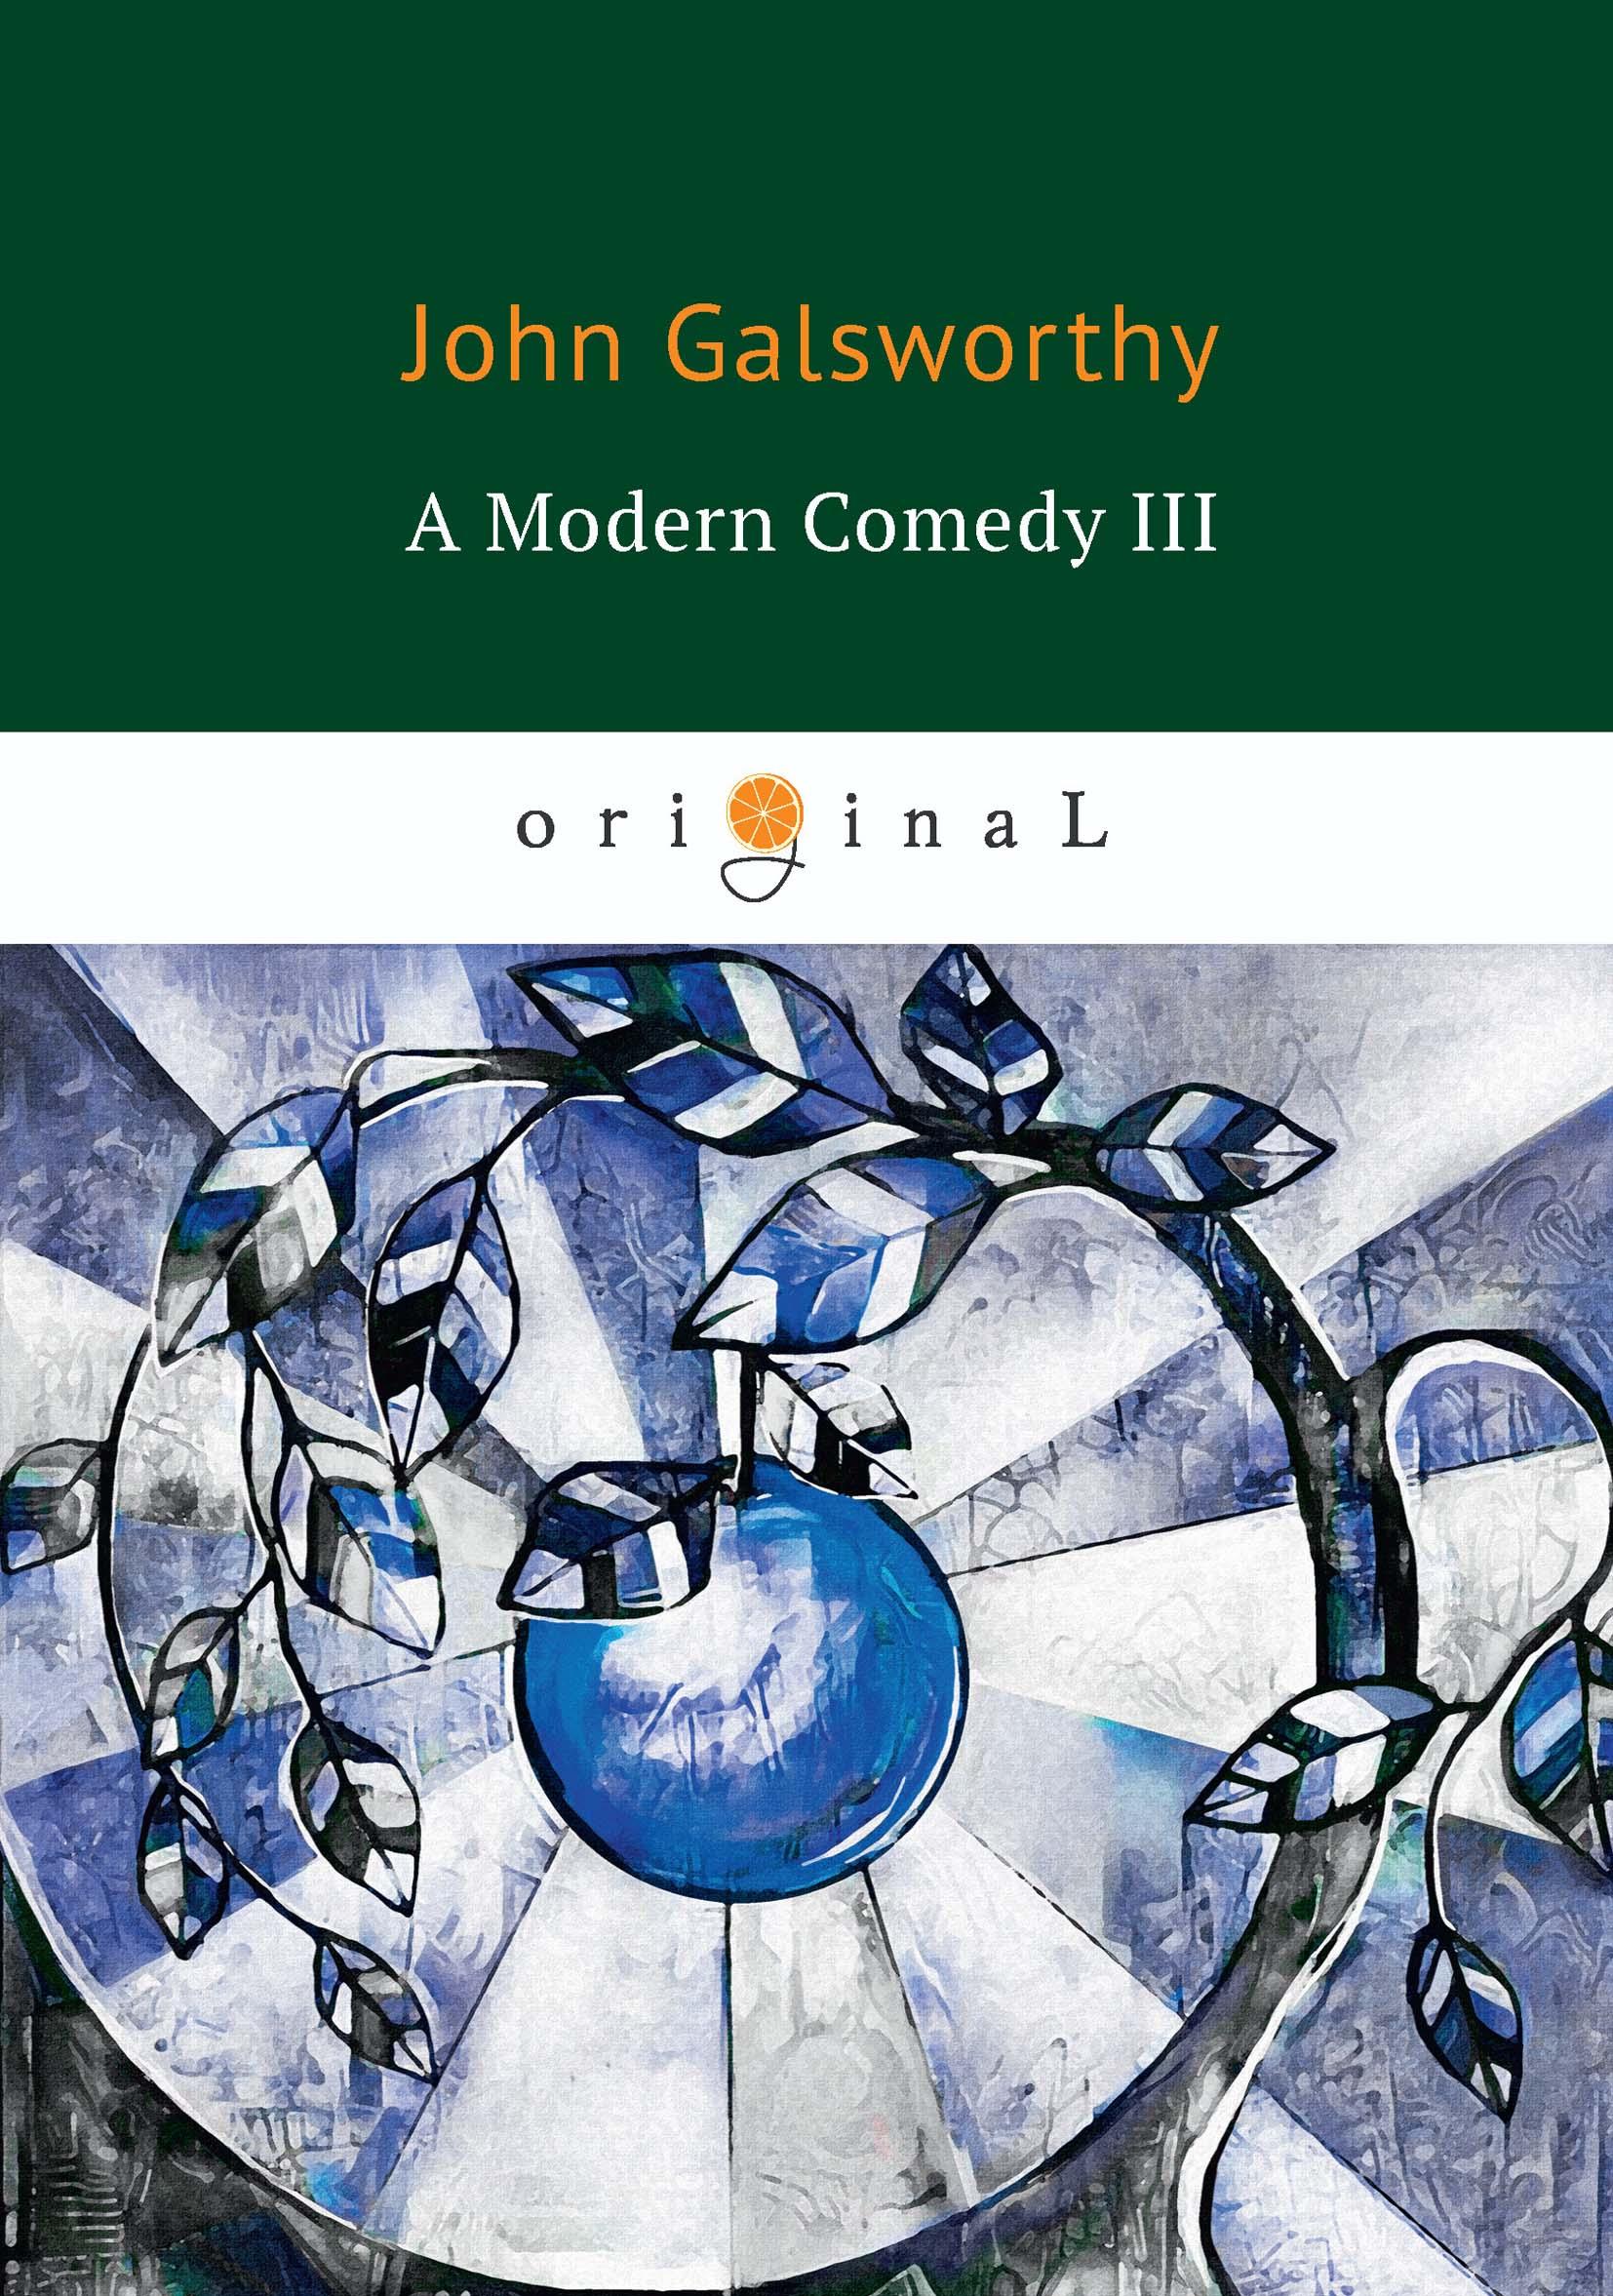 лучшая цена John Galsworthy A Modern Comedy III